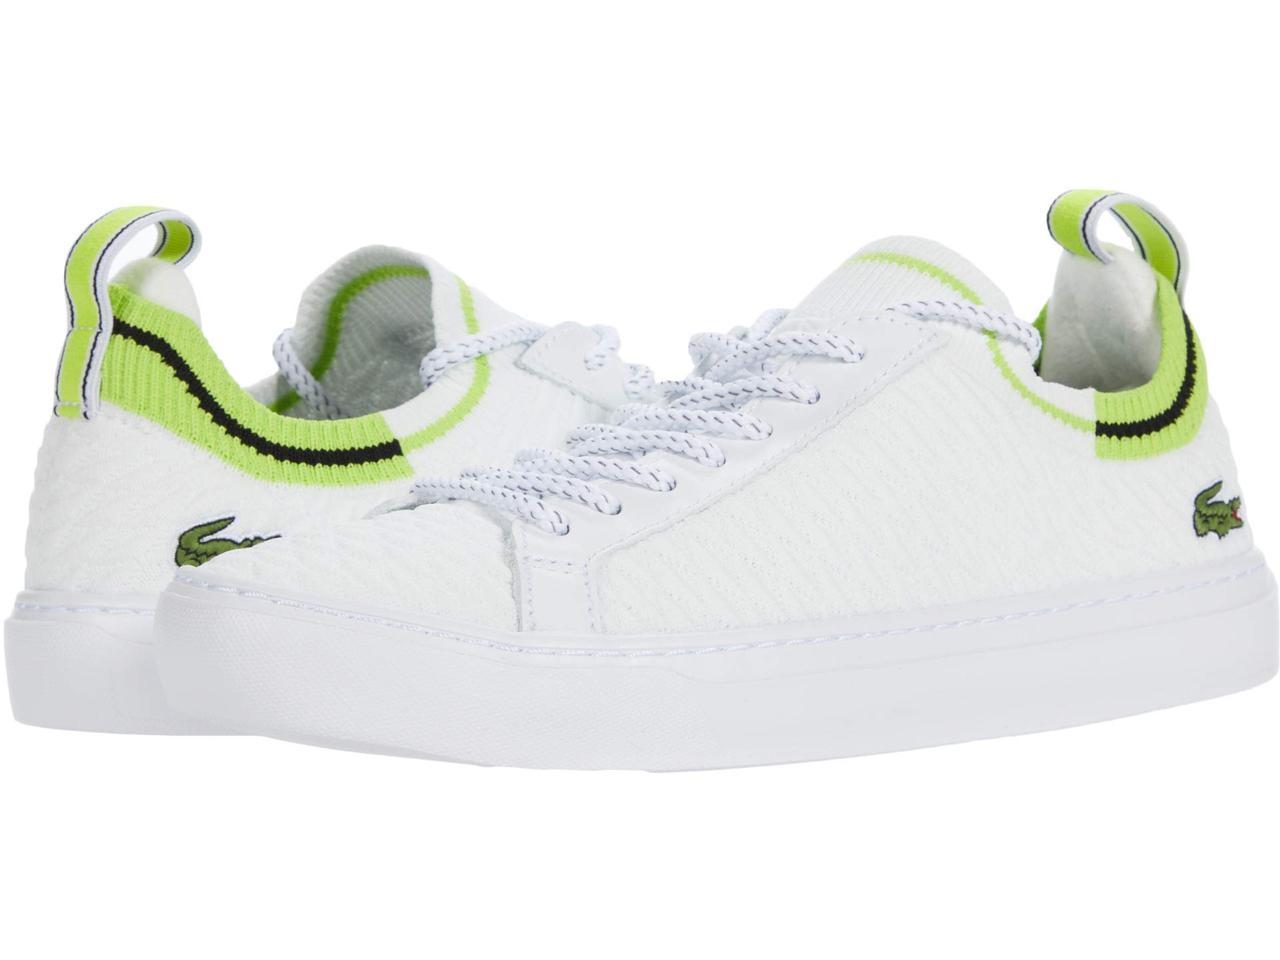 Кроссовки/Кеды (Оригинал) Lacoste La Piquée 0120 1 White/Light Green